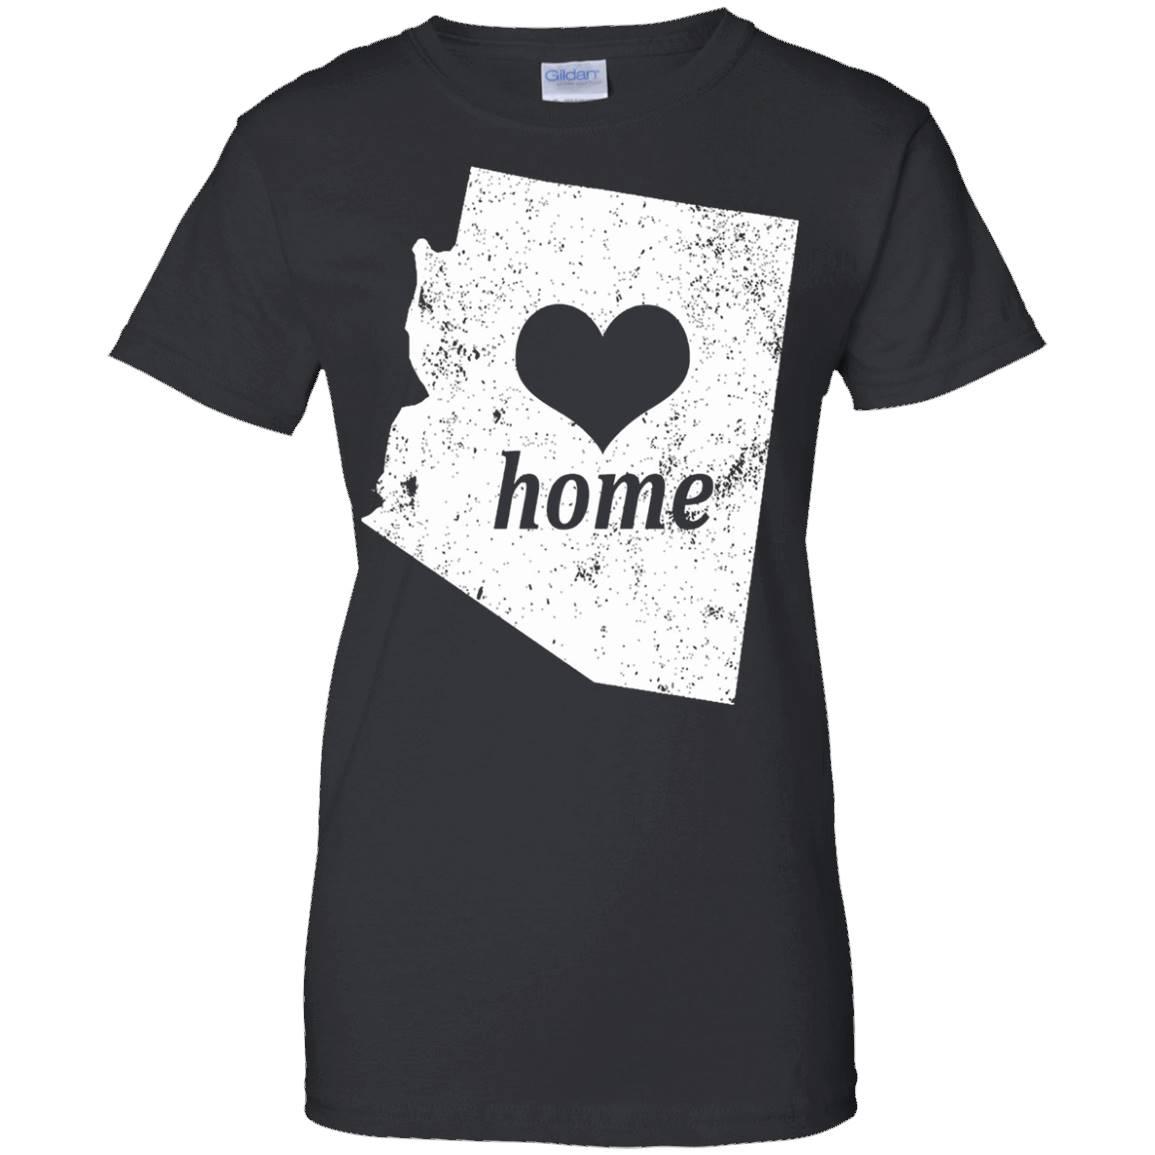 I Love Arizona Home T Shirt Arizona Gifts Arizona Shirt – T-Shirt